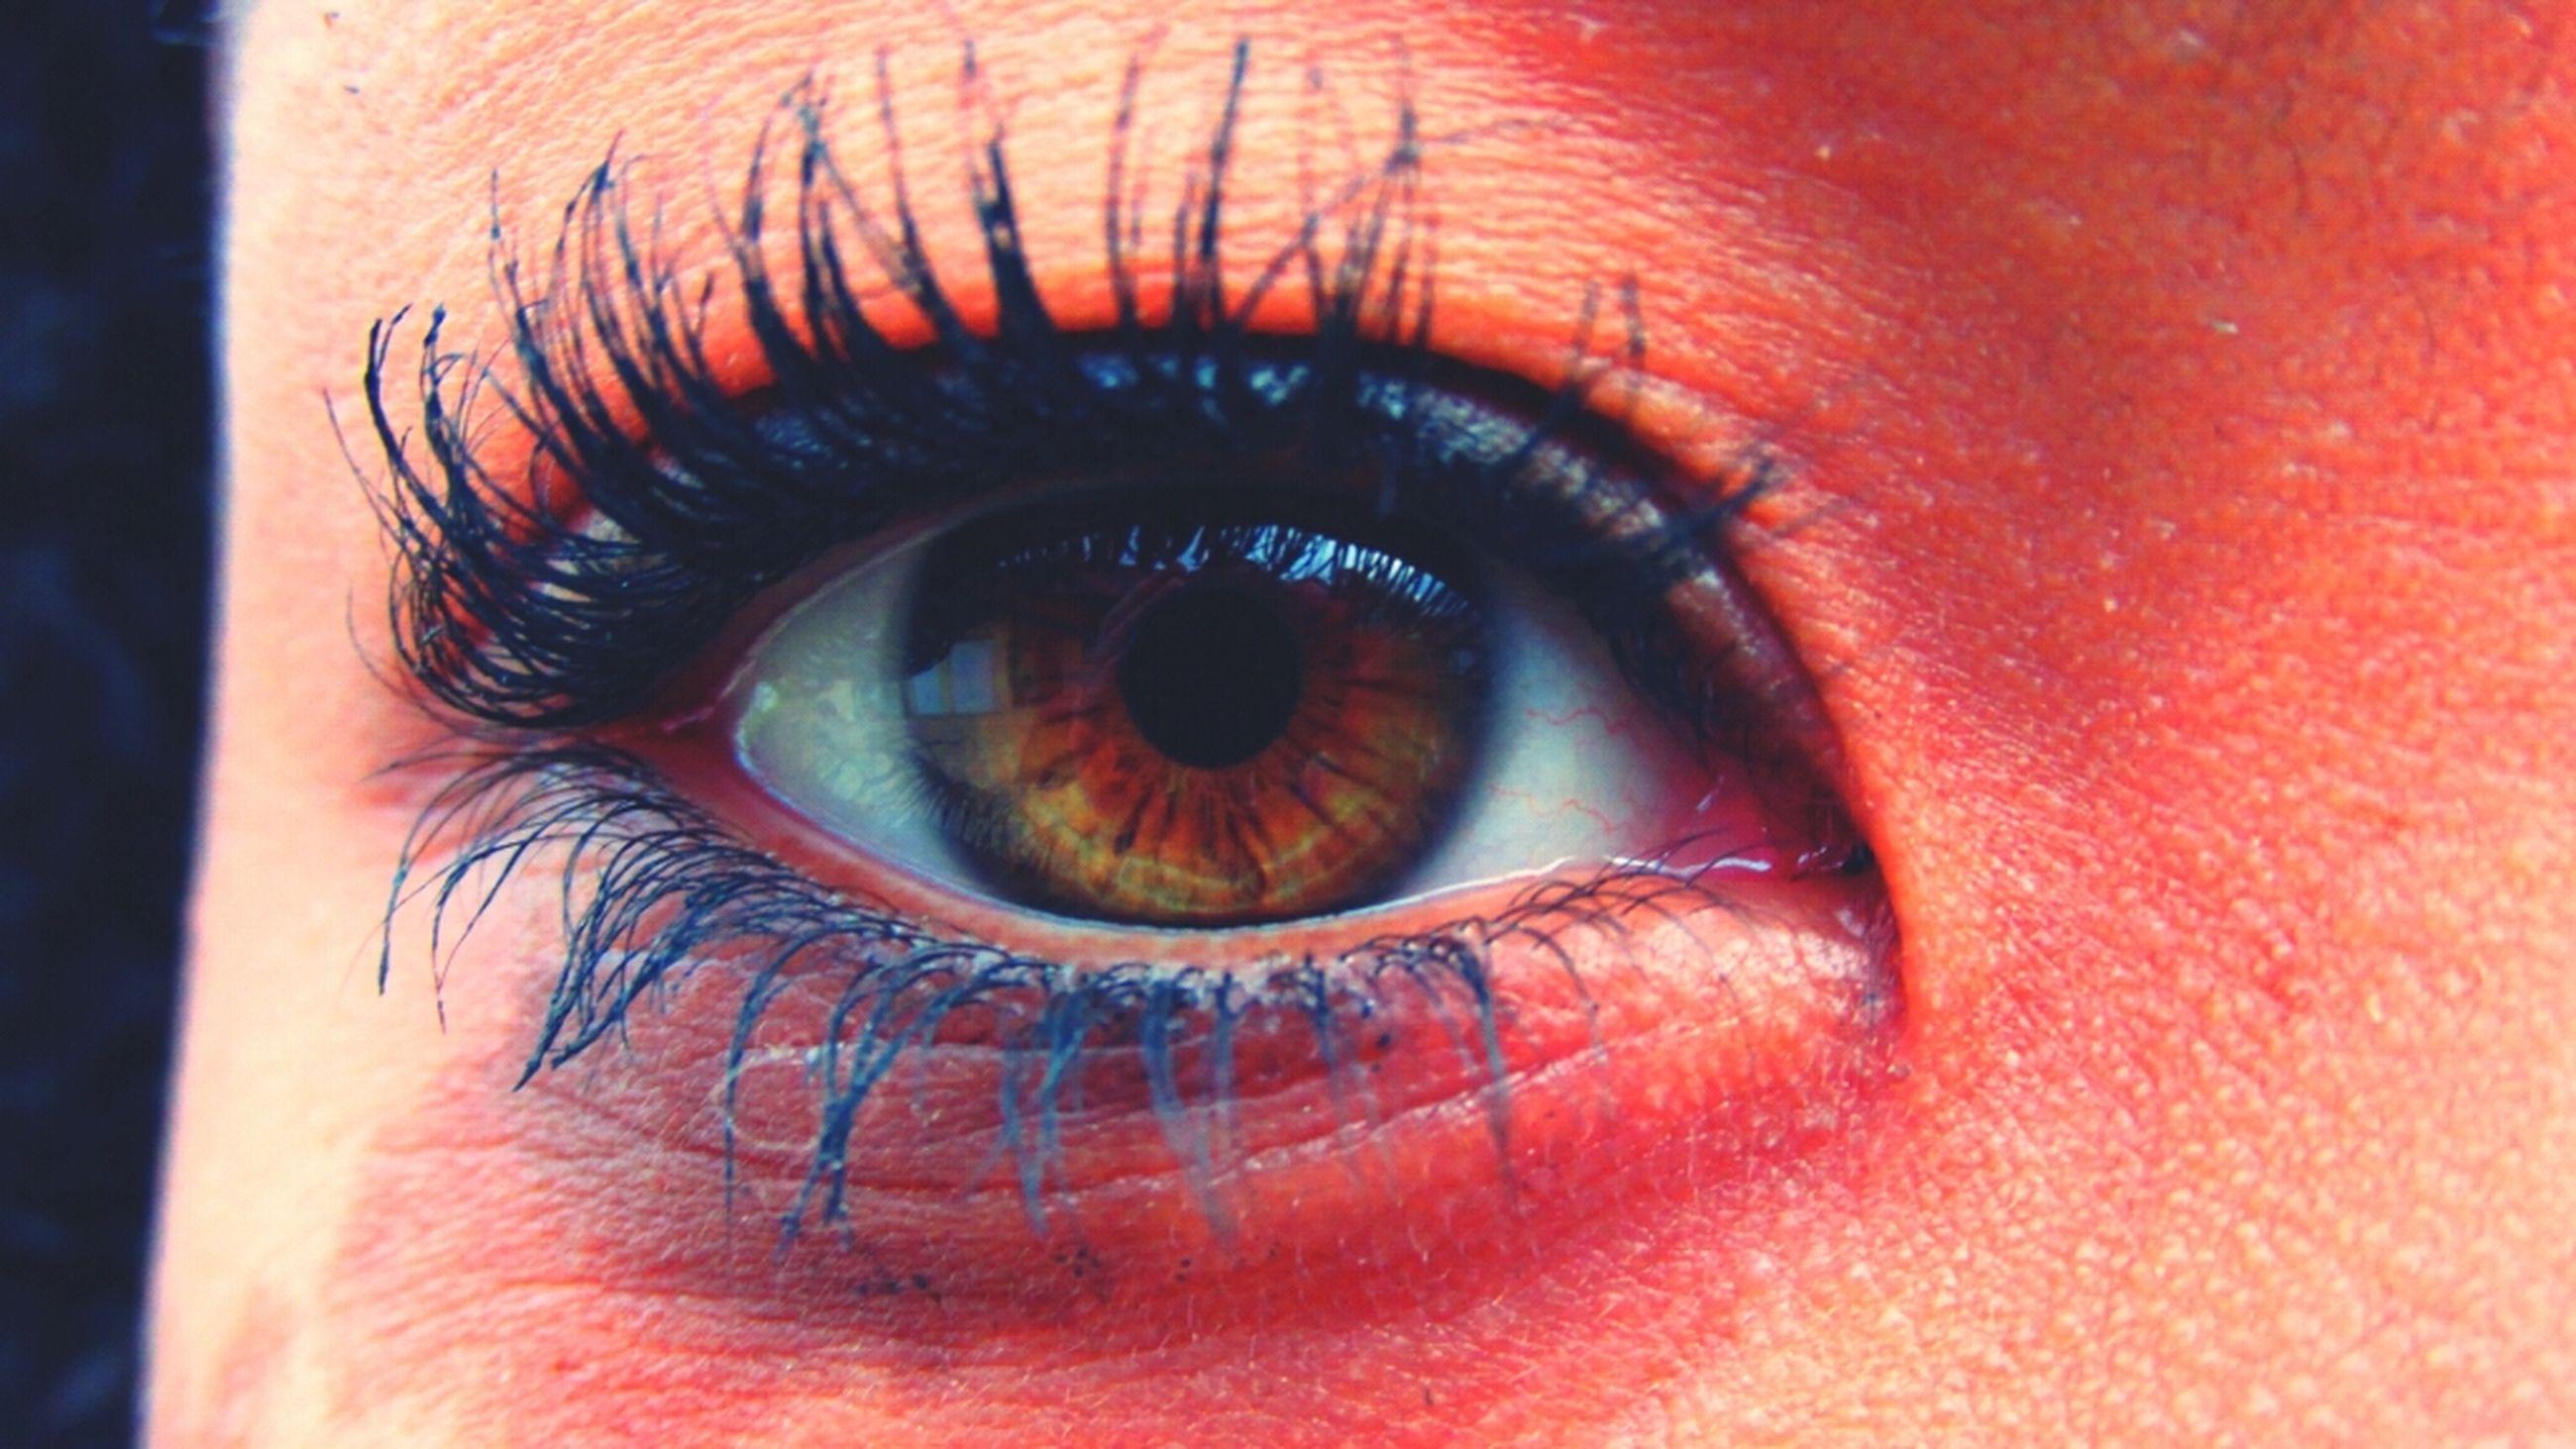 human eye, eyelash, close-up, eyesight, extreme close-up, sensory perception, part of, iris - eye, eyeball, full frame, extreme close up, human skin, portrait, human face, looking at camera, unrecognizable person, macro